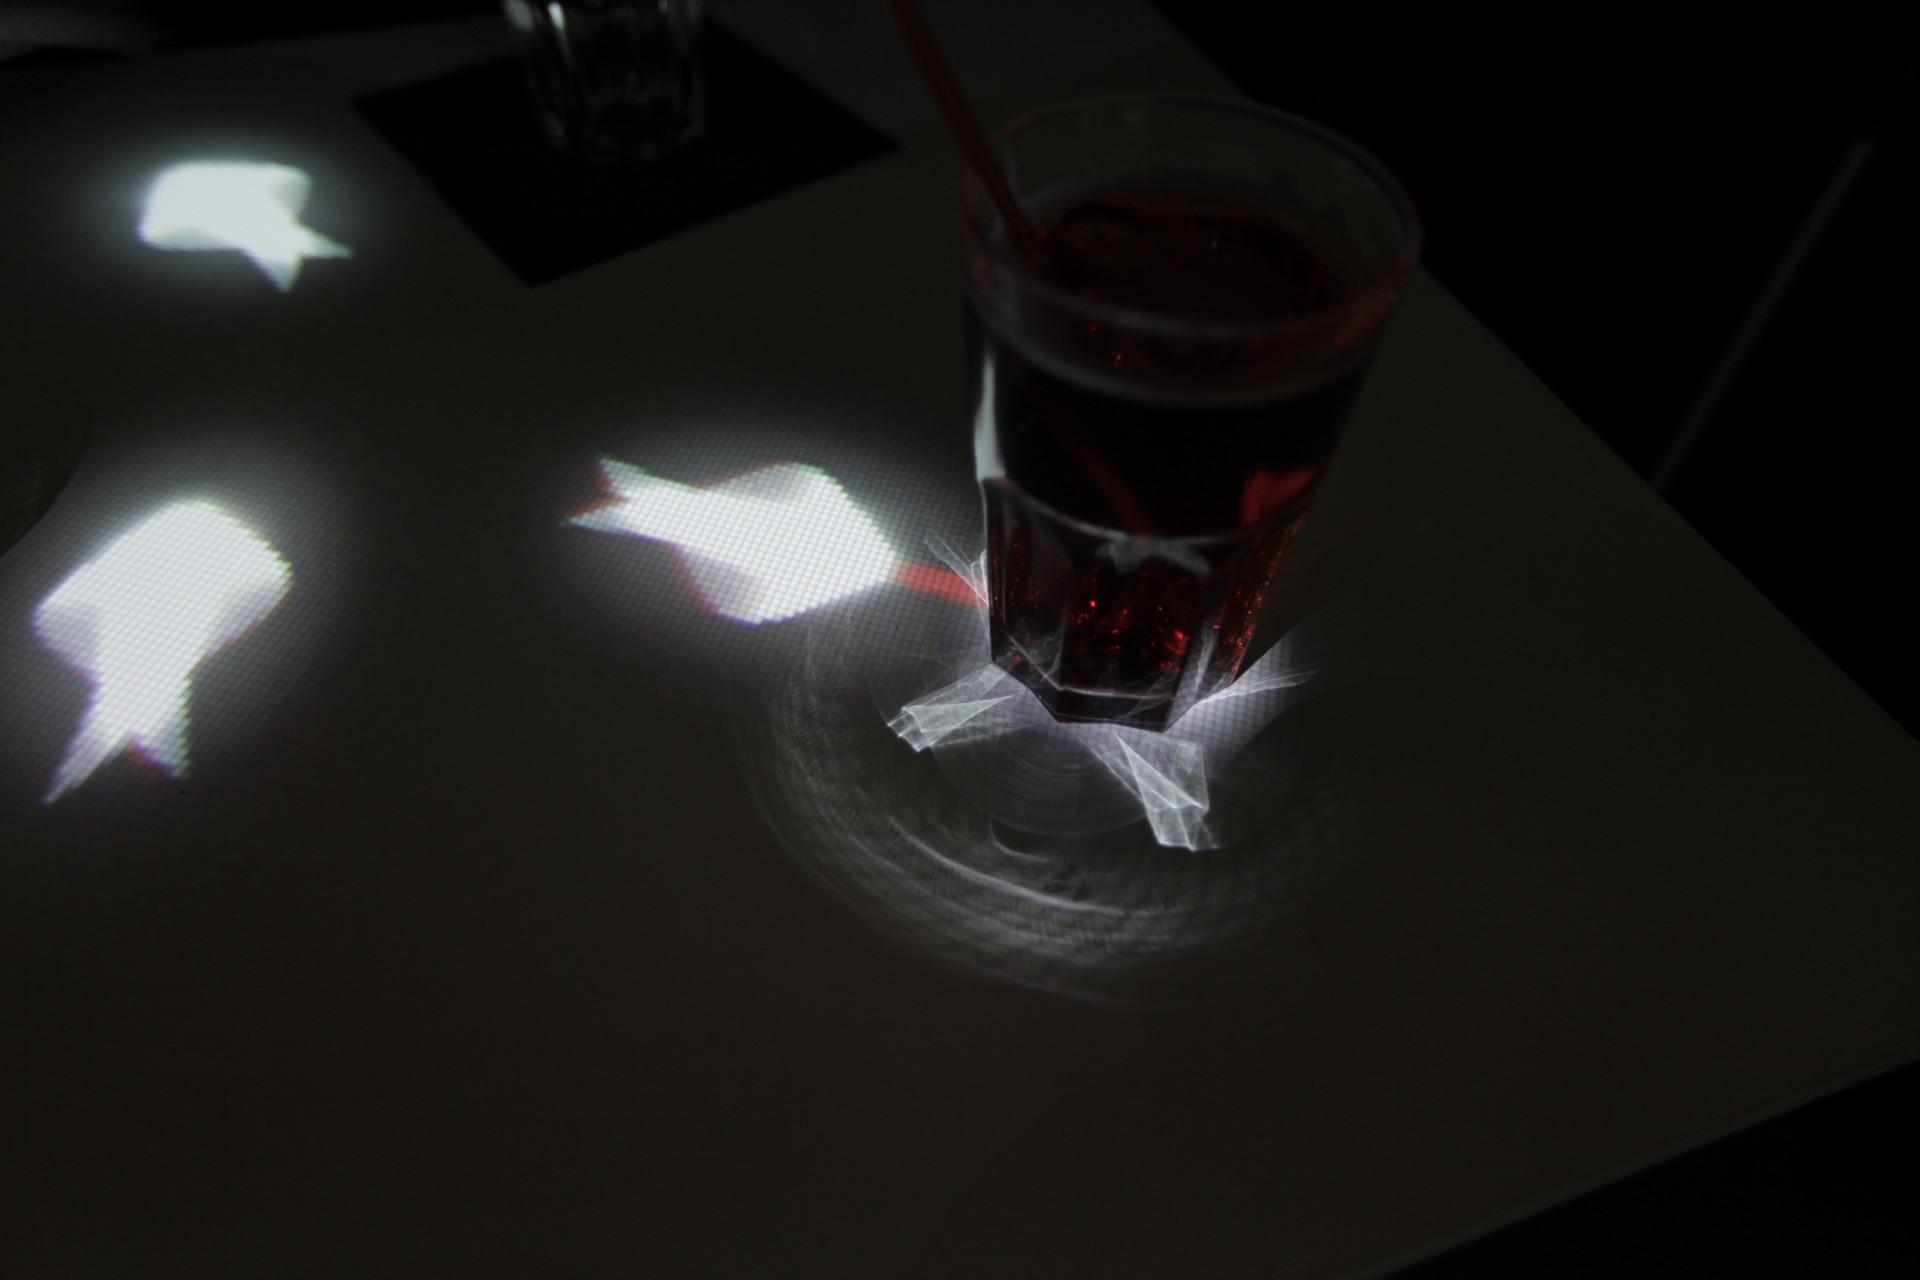 ANN-KATRIN KRENZ Lichtung